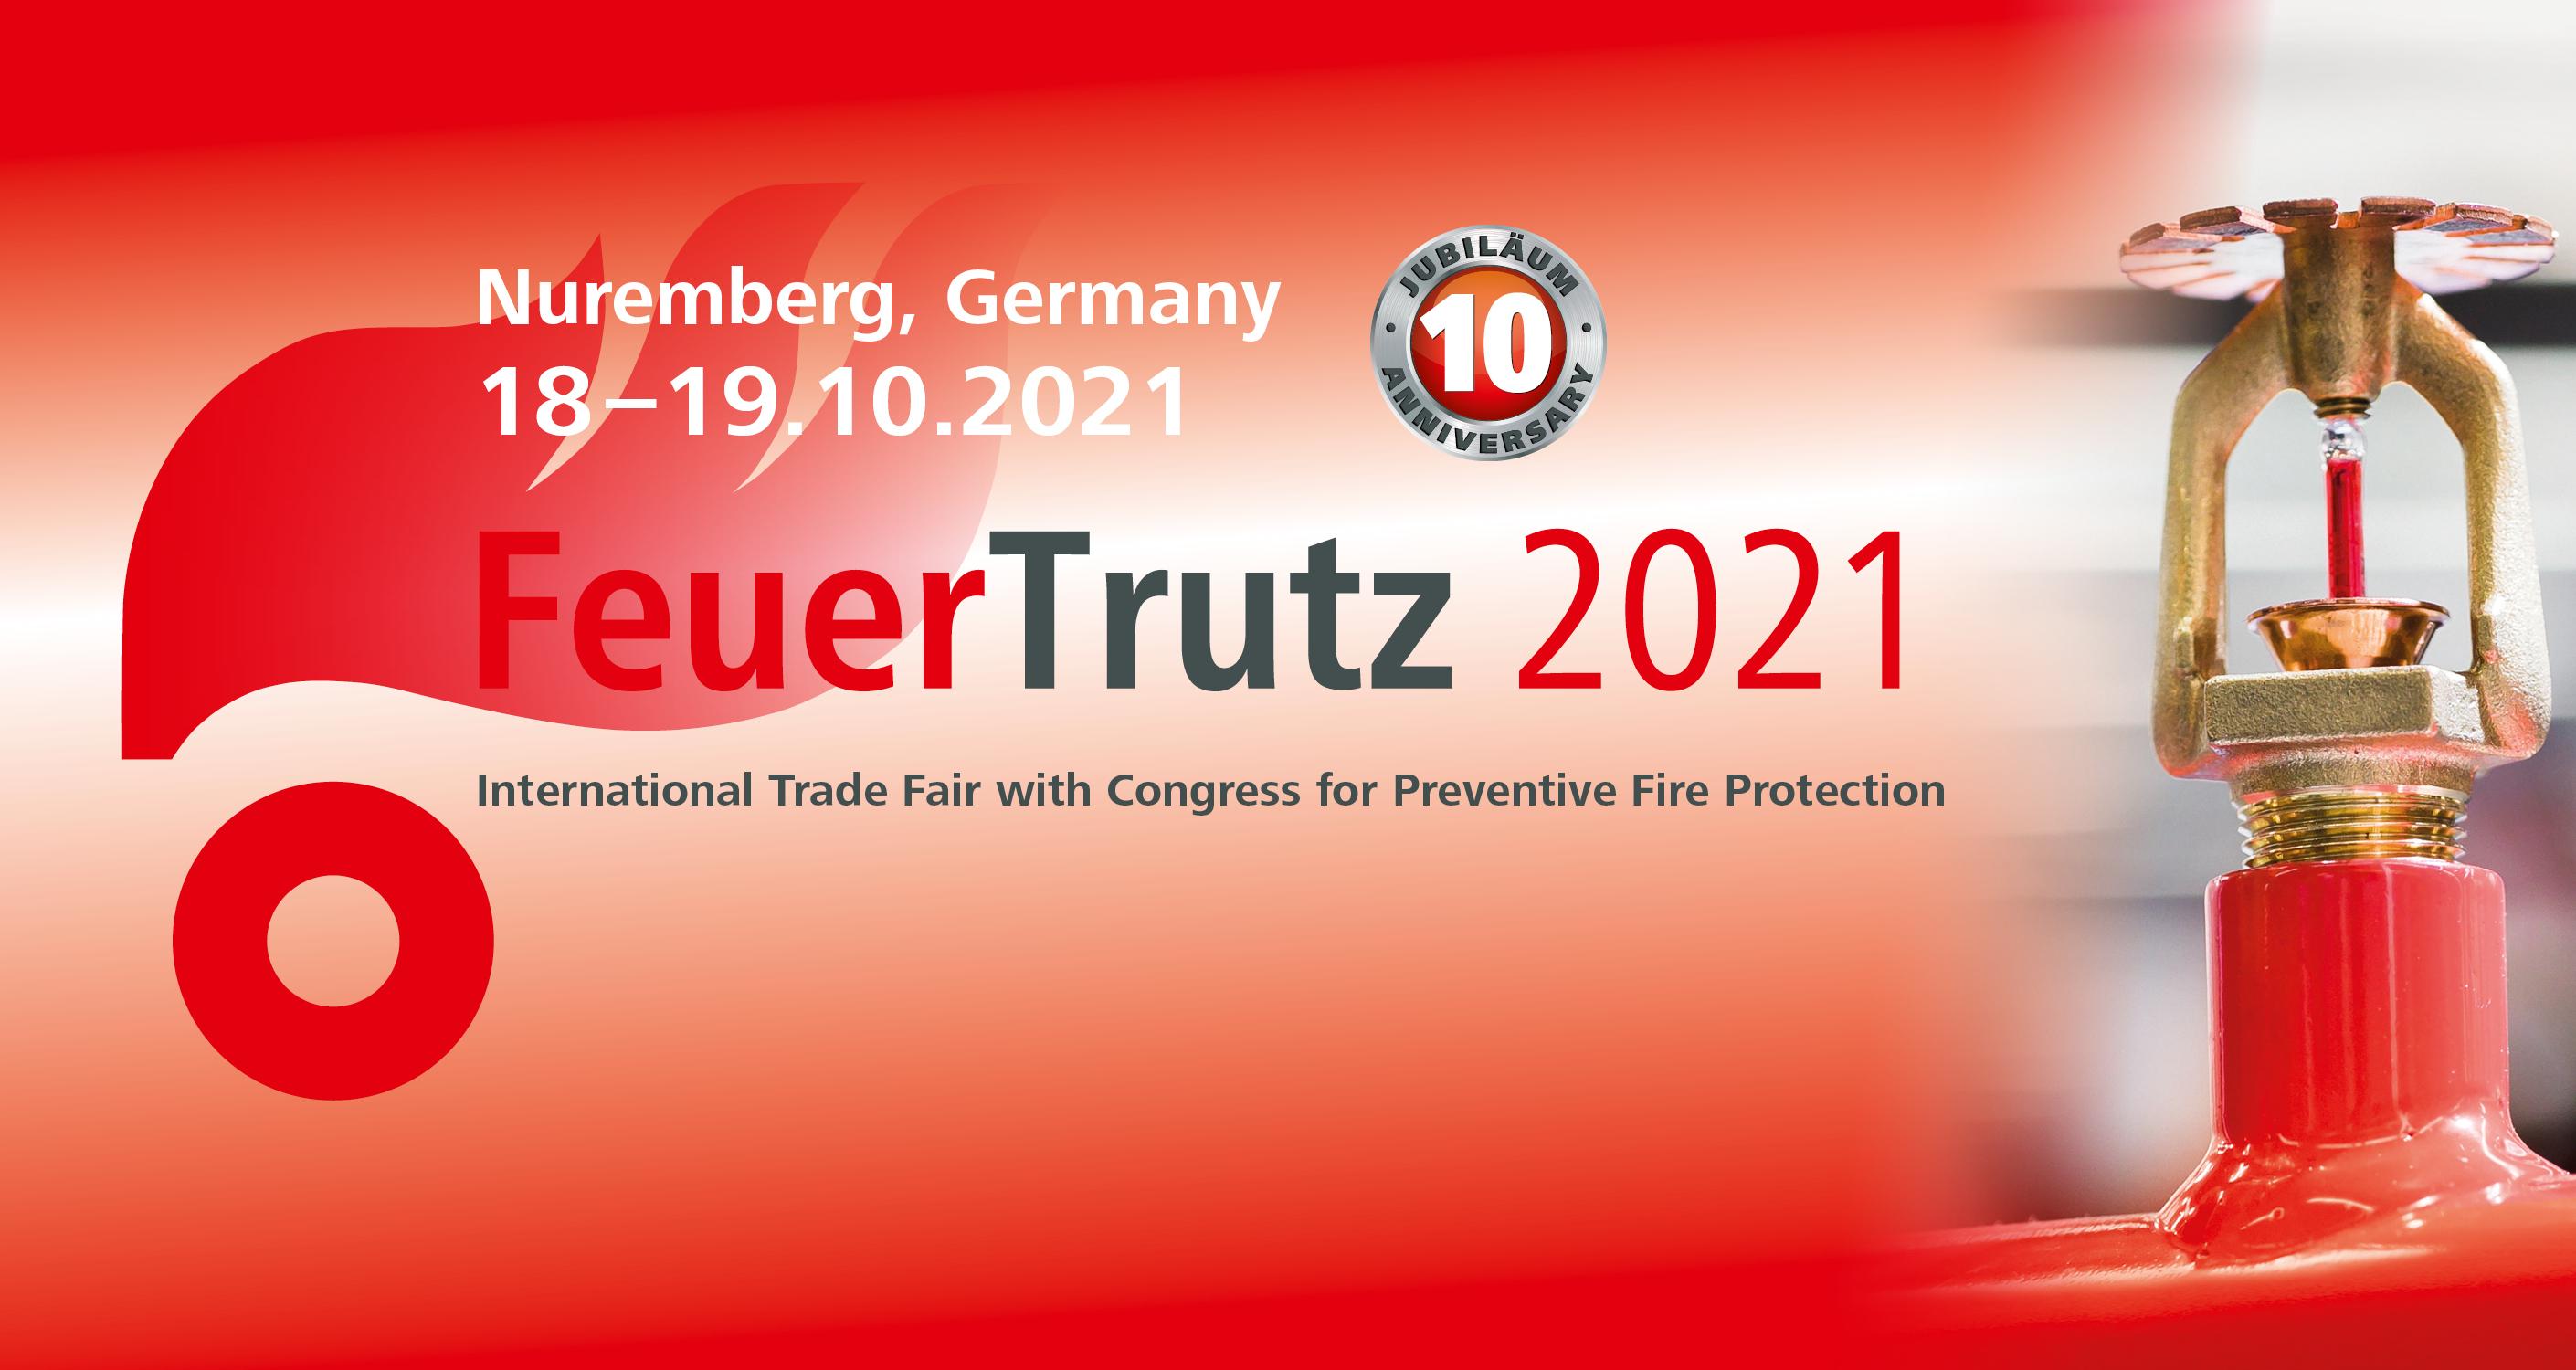 FeuerTrutz 2021 - Become an exhibitor now!